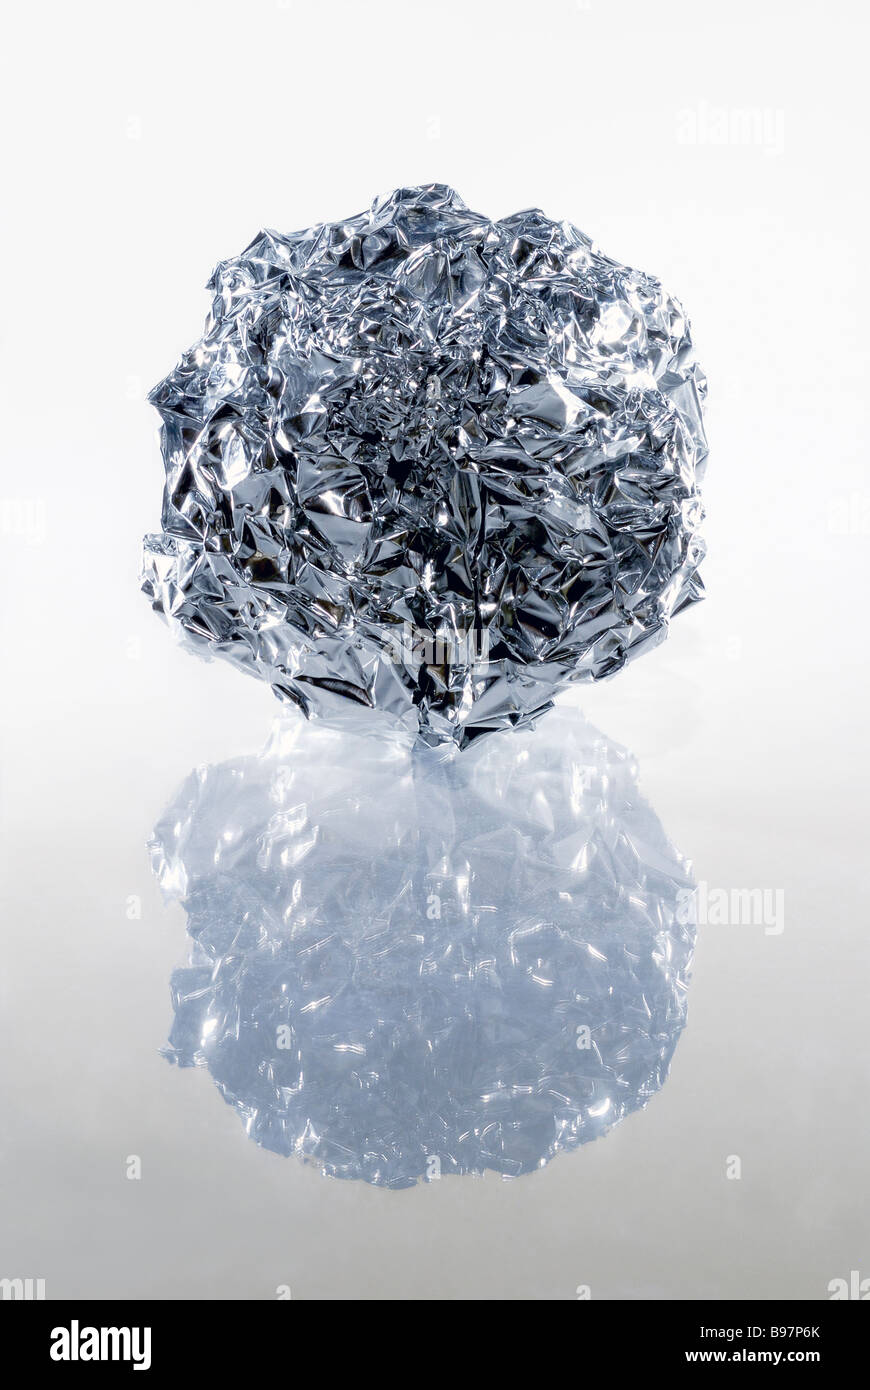 Ball of tin foil - Stock Image